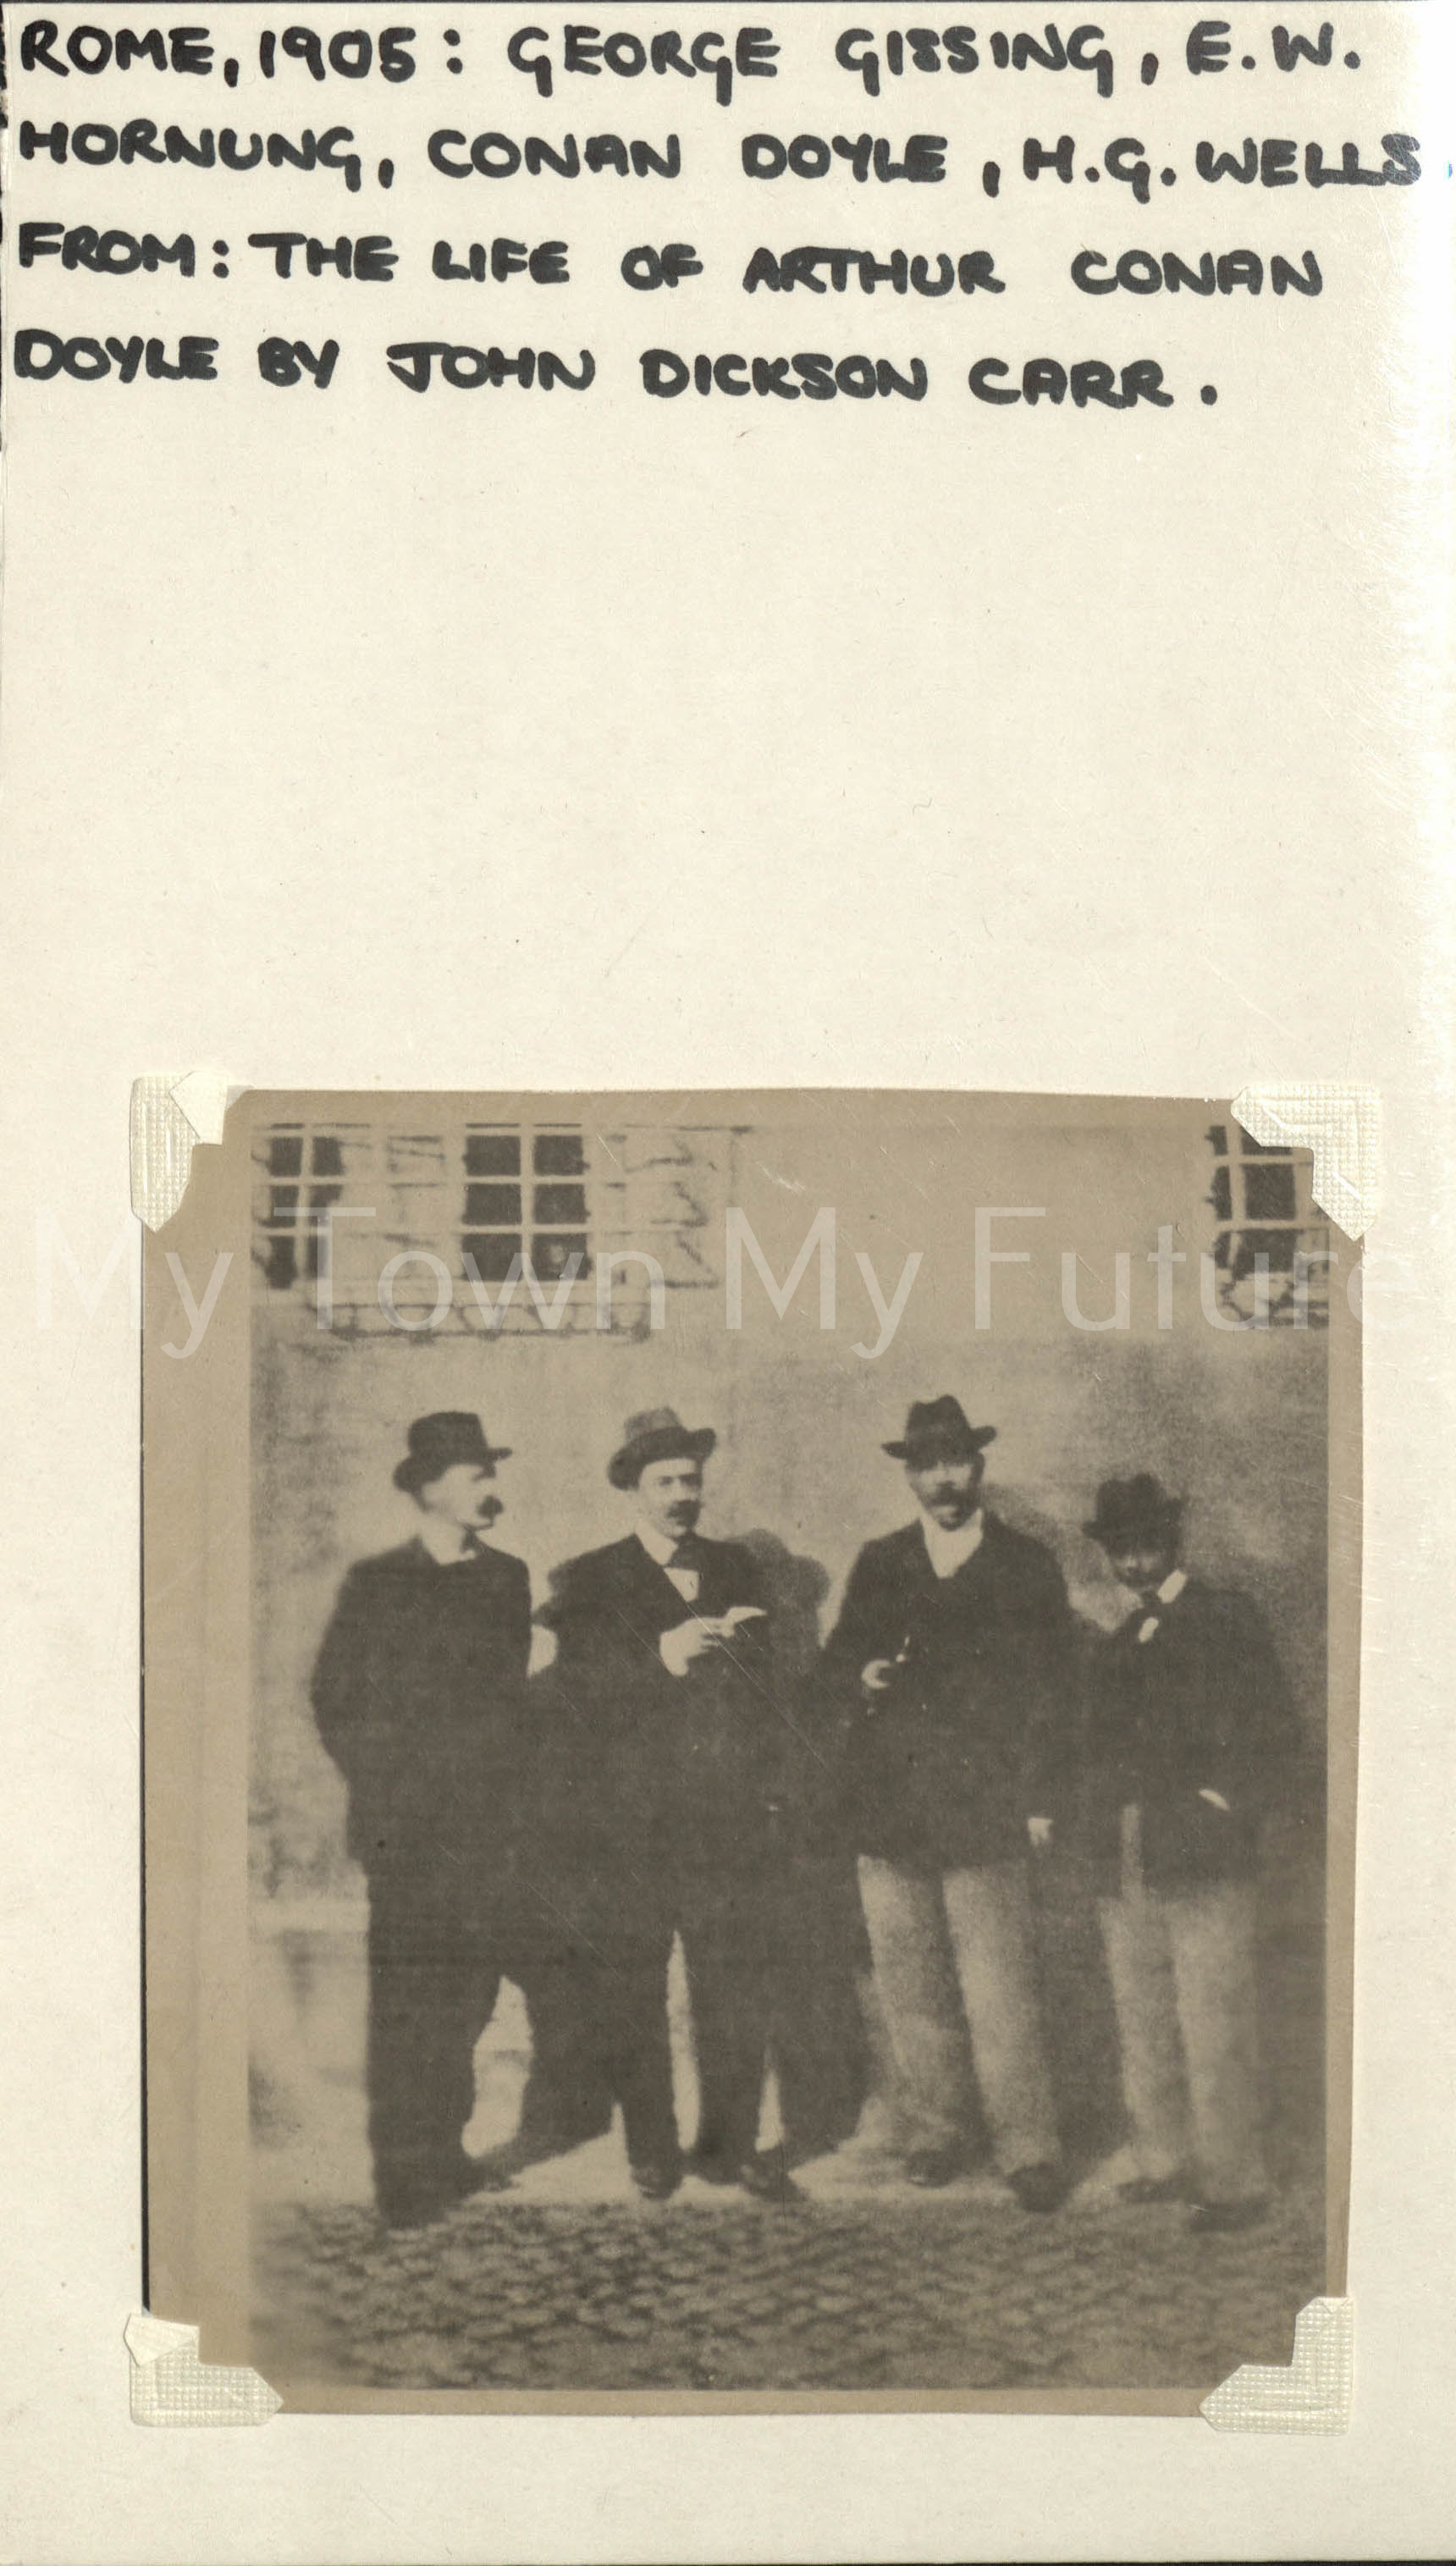 George Gissing,HG Wells,Conan Doyle,EW Hornung